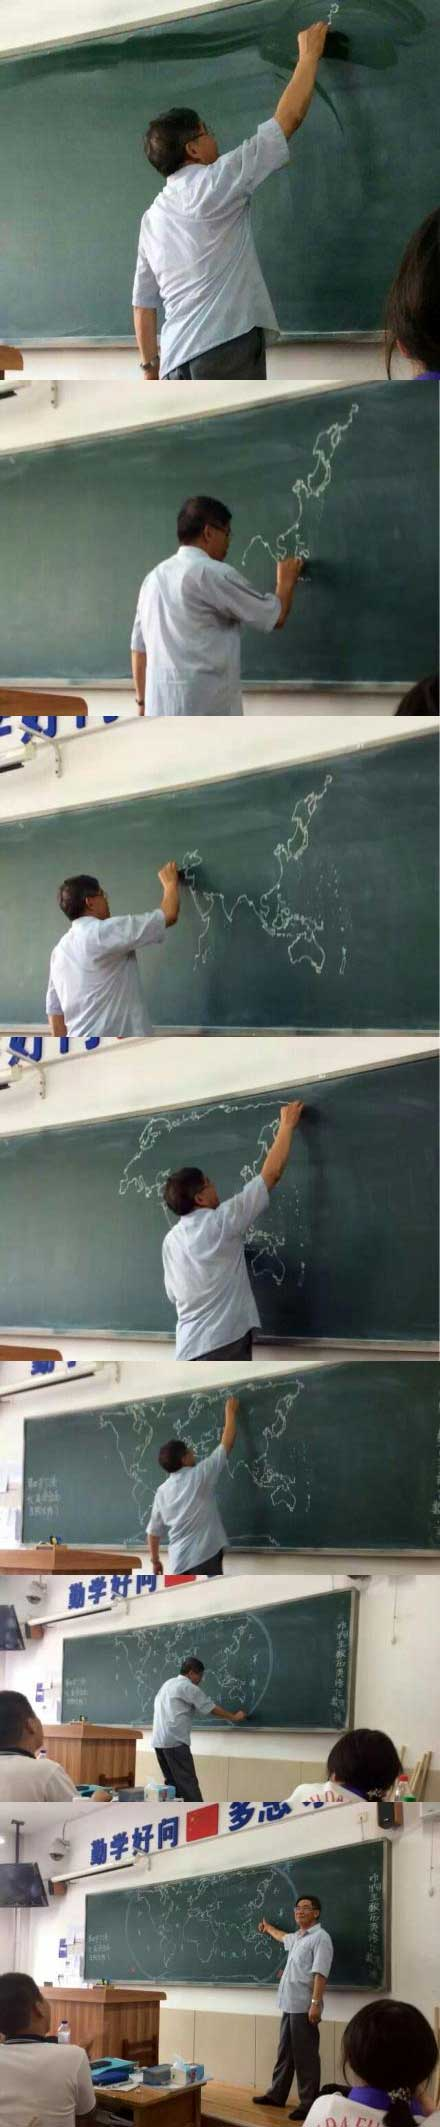 el mejor profesor de geografia